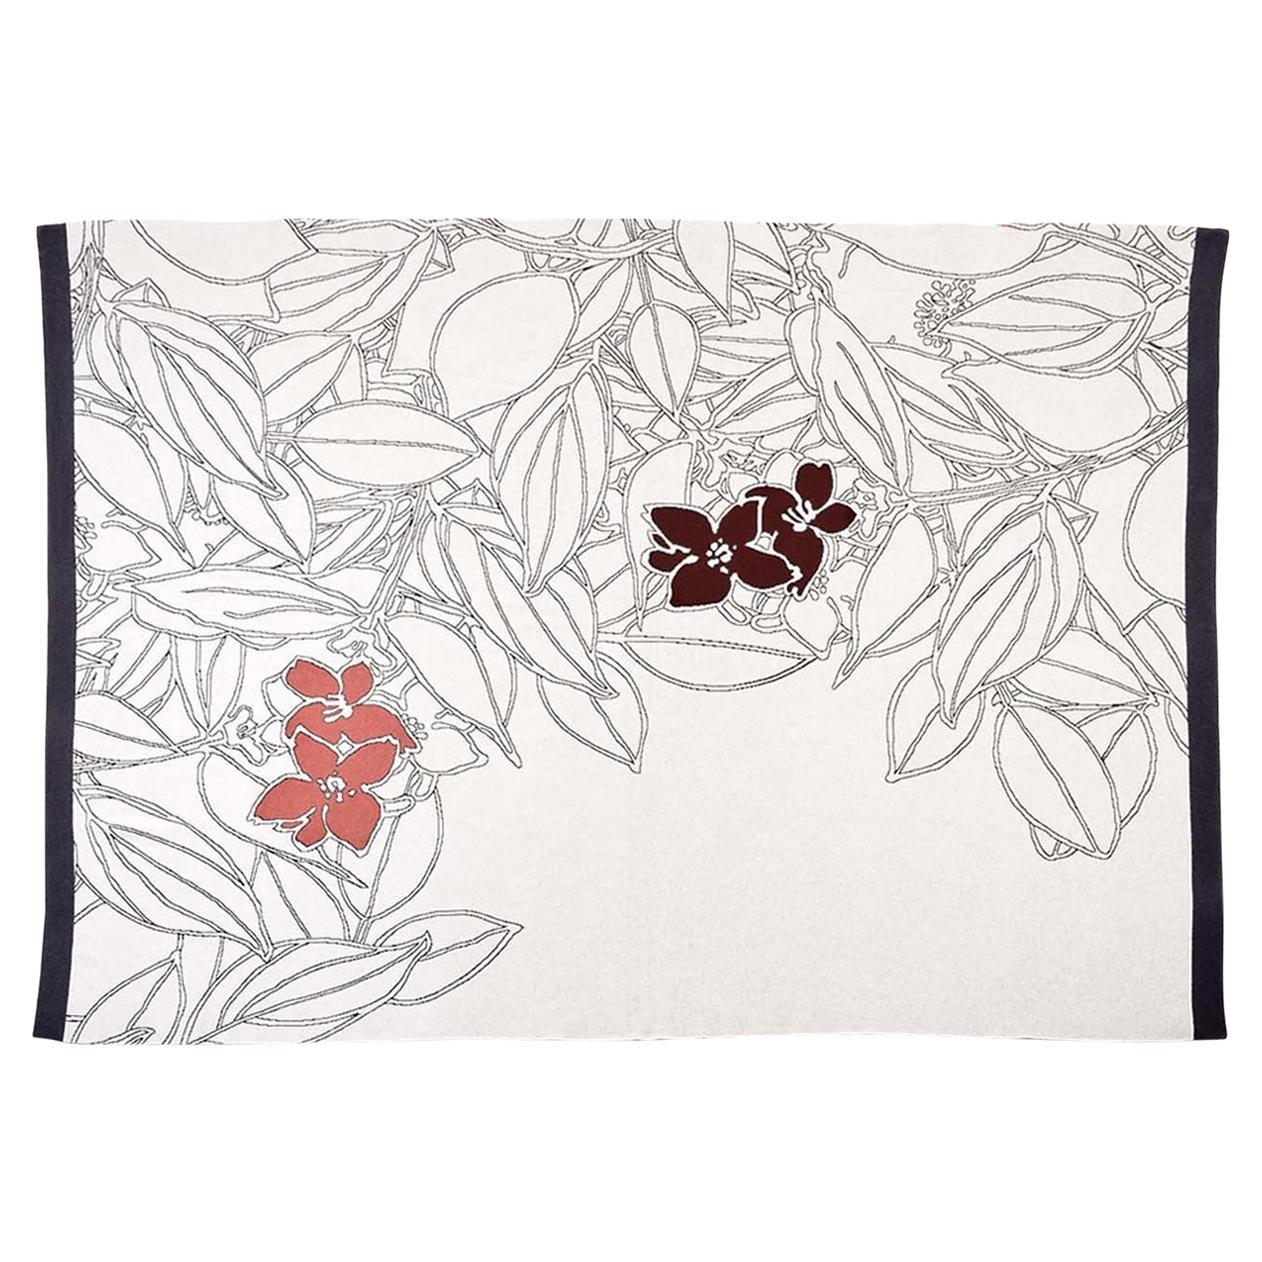 Foliage Blanket by Roberta Licini